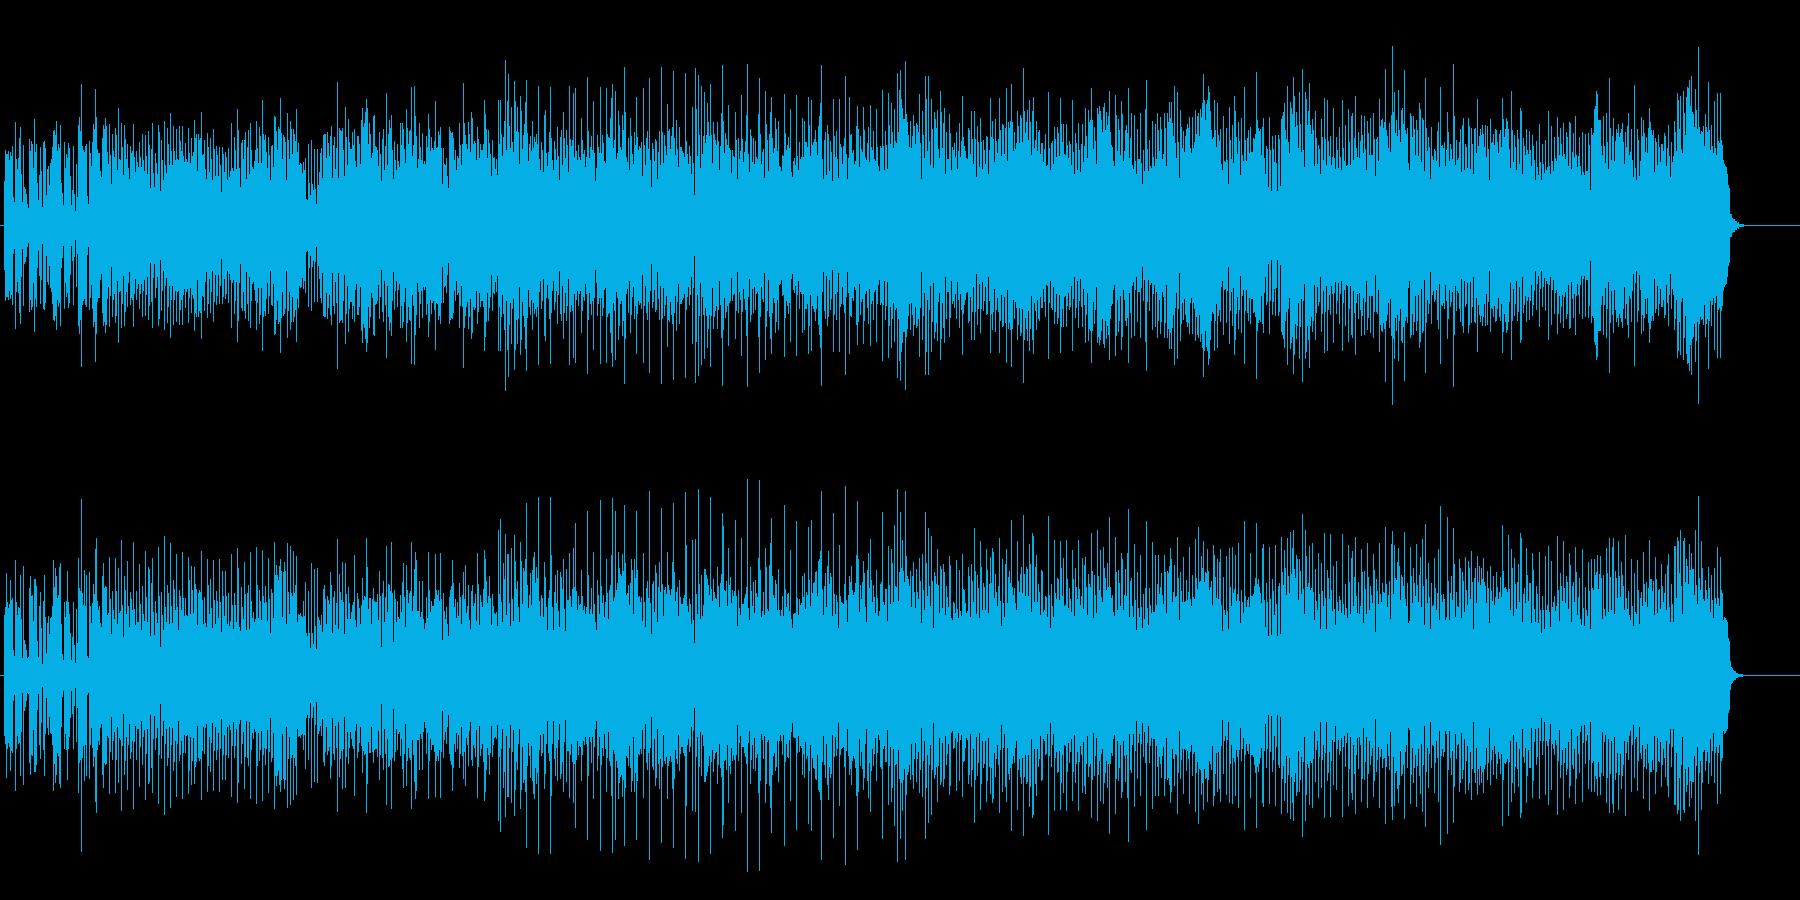 70'sオマージュ・ロックの再生済みの波形